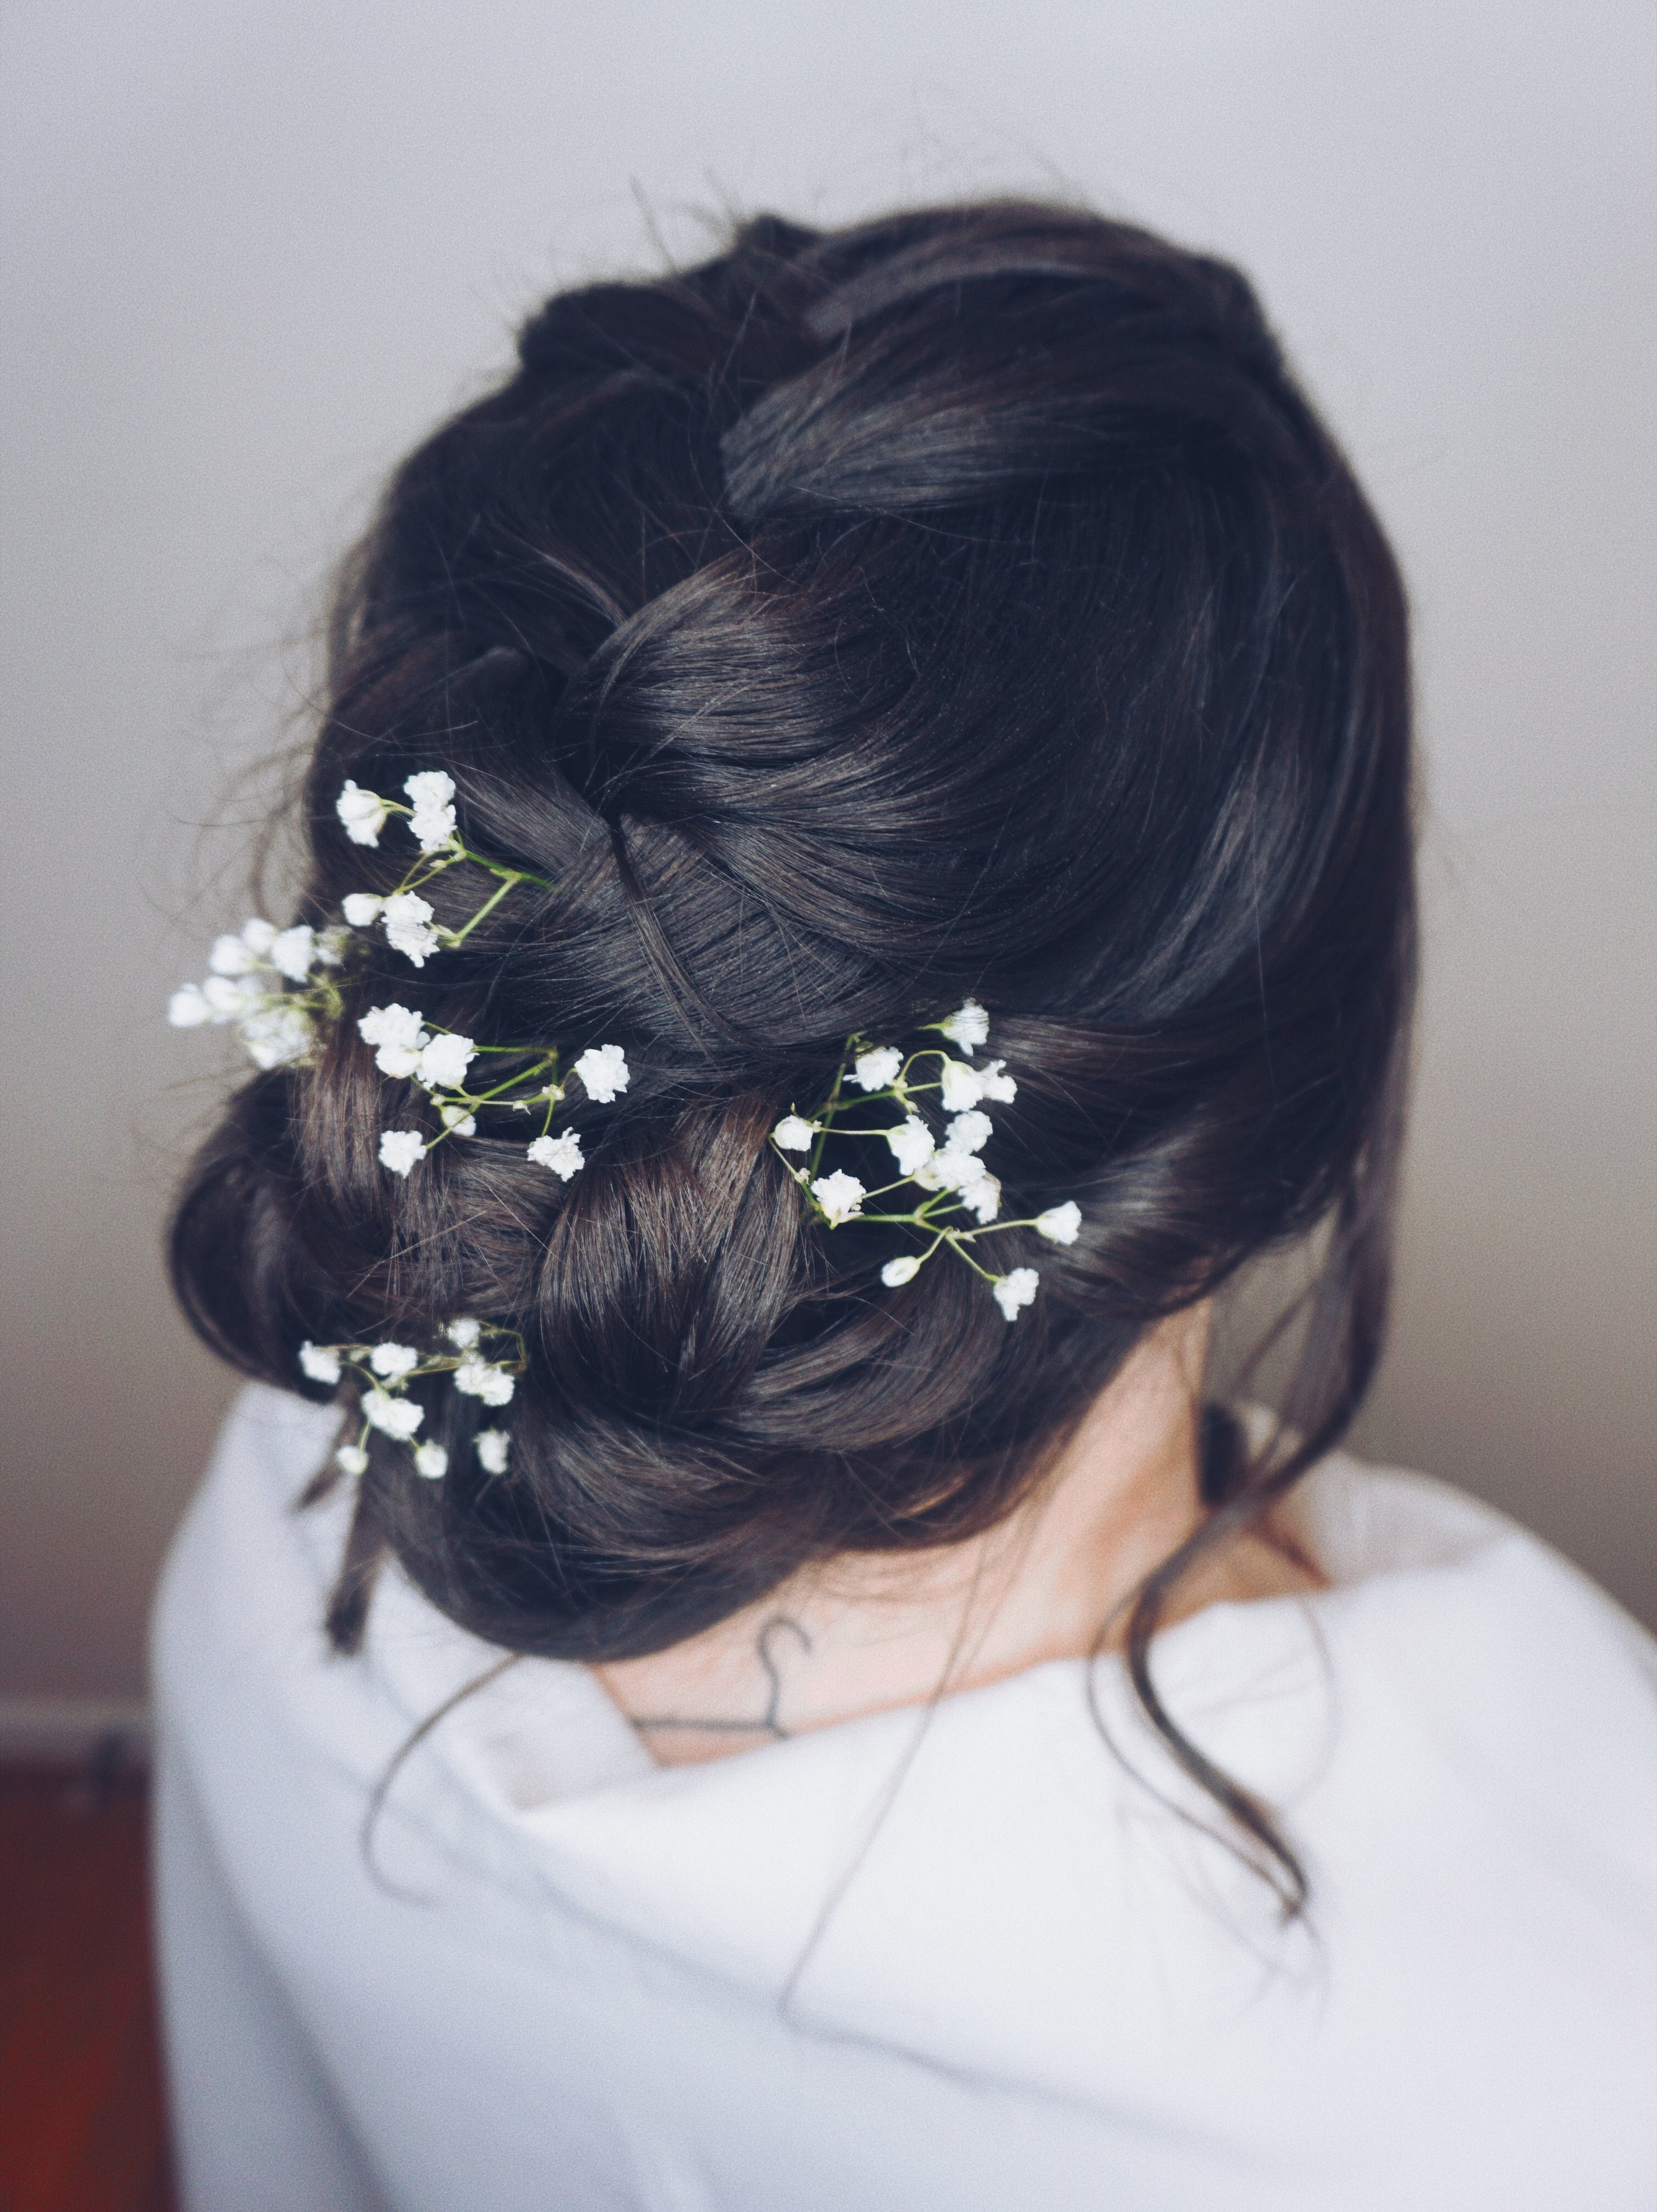 Romantic textured low bun with braids & florals